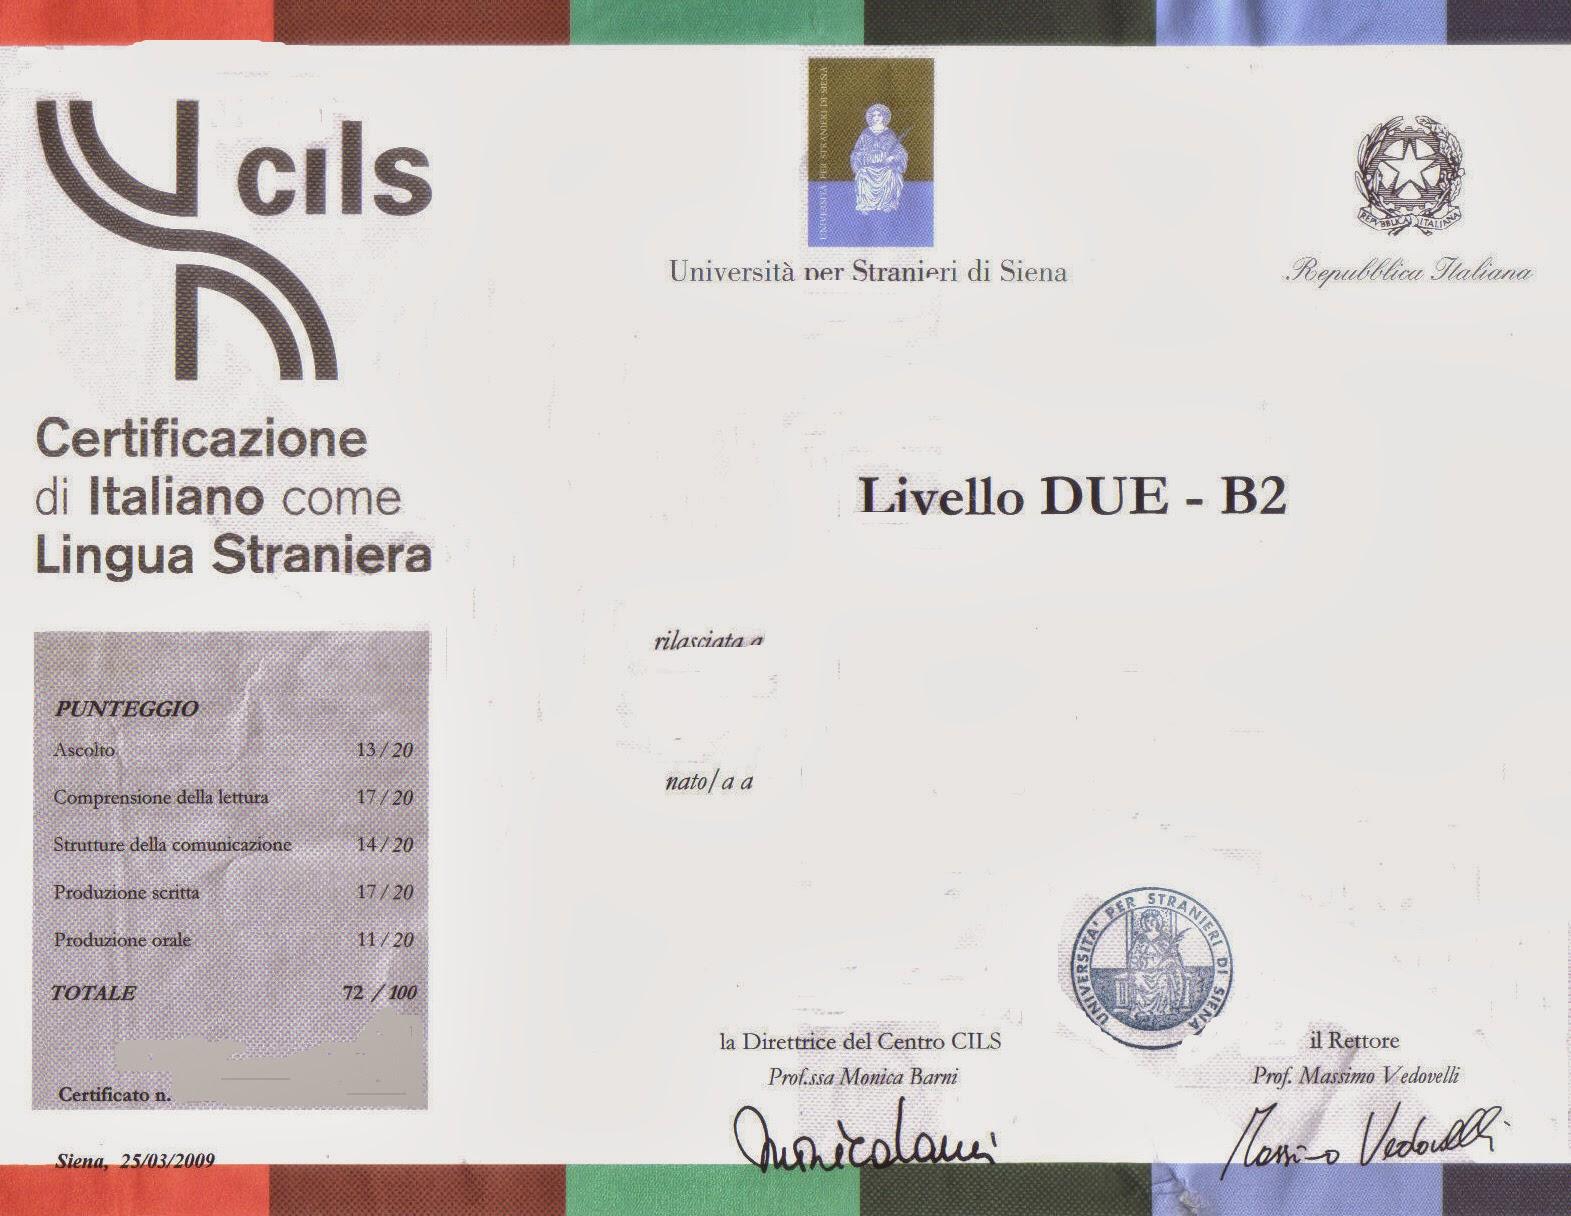 Emejing esame lingua italiana per carta di soggiorno for Test italiano per carta di soggiorno 2016